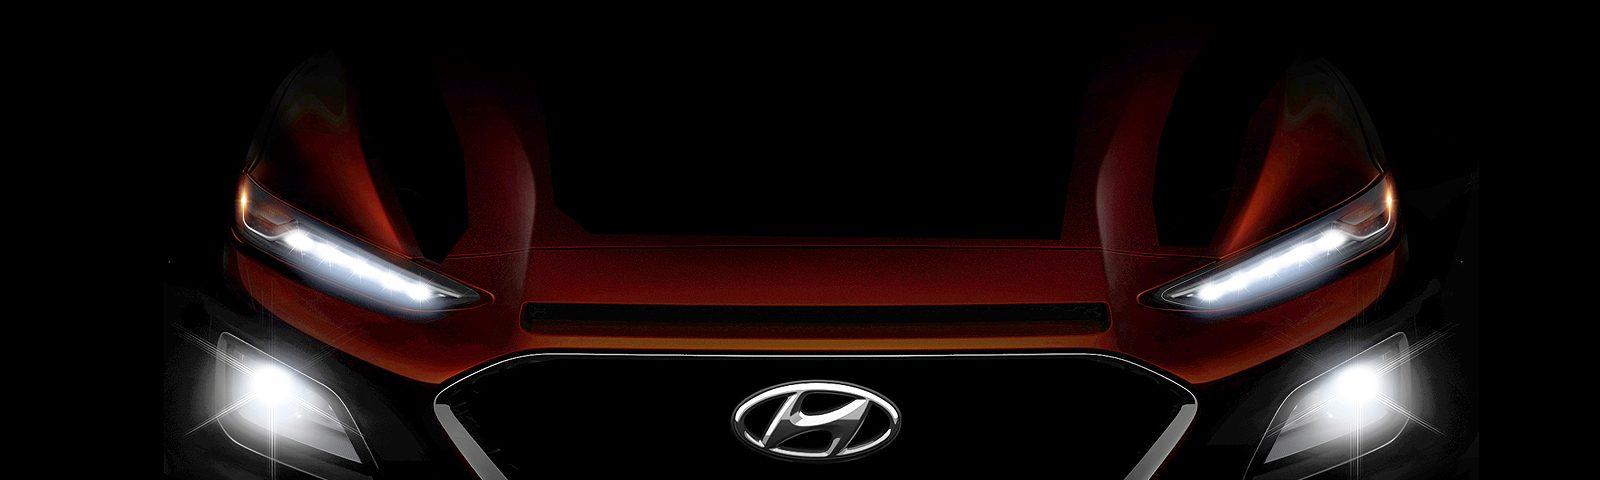 Hyundai First Release Trailer of New Suv Kona